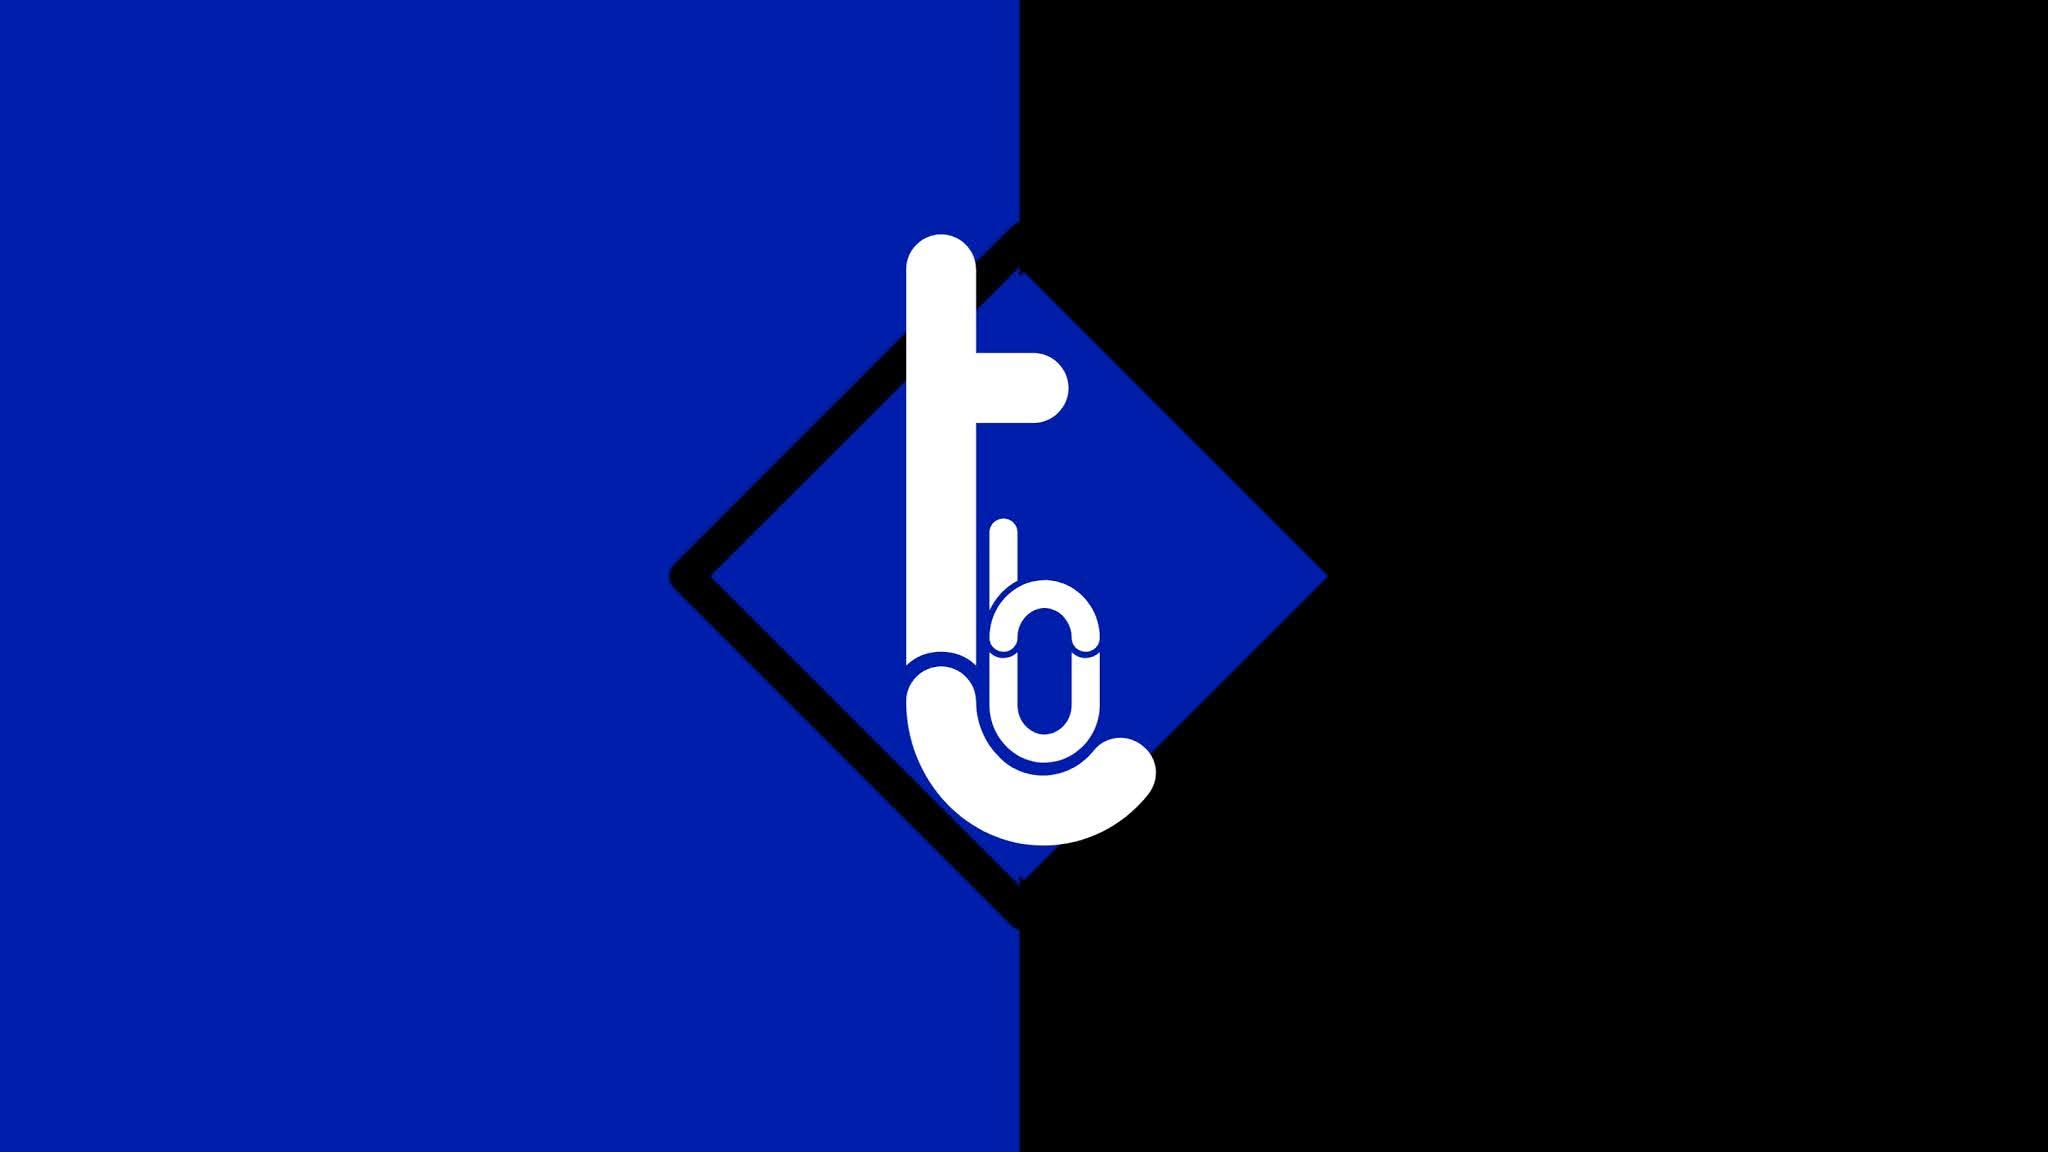 ThemeBD - banner design